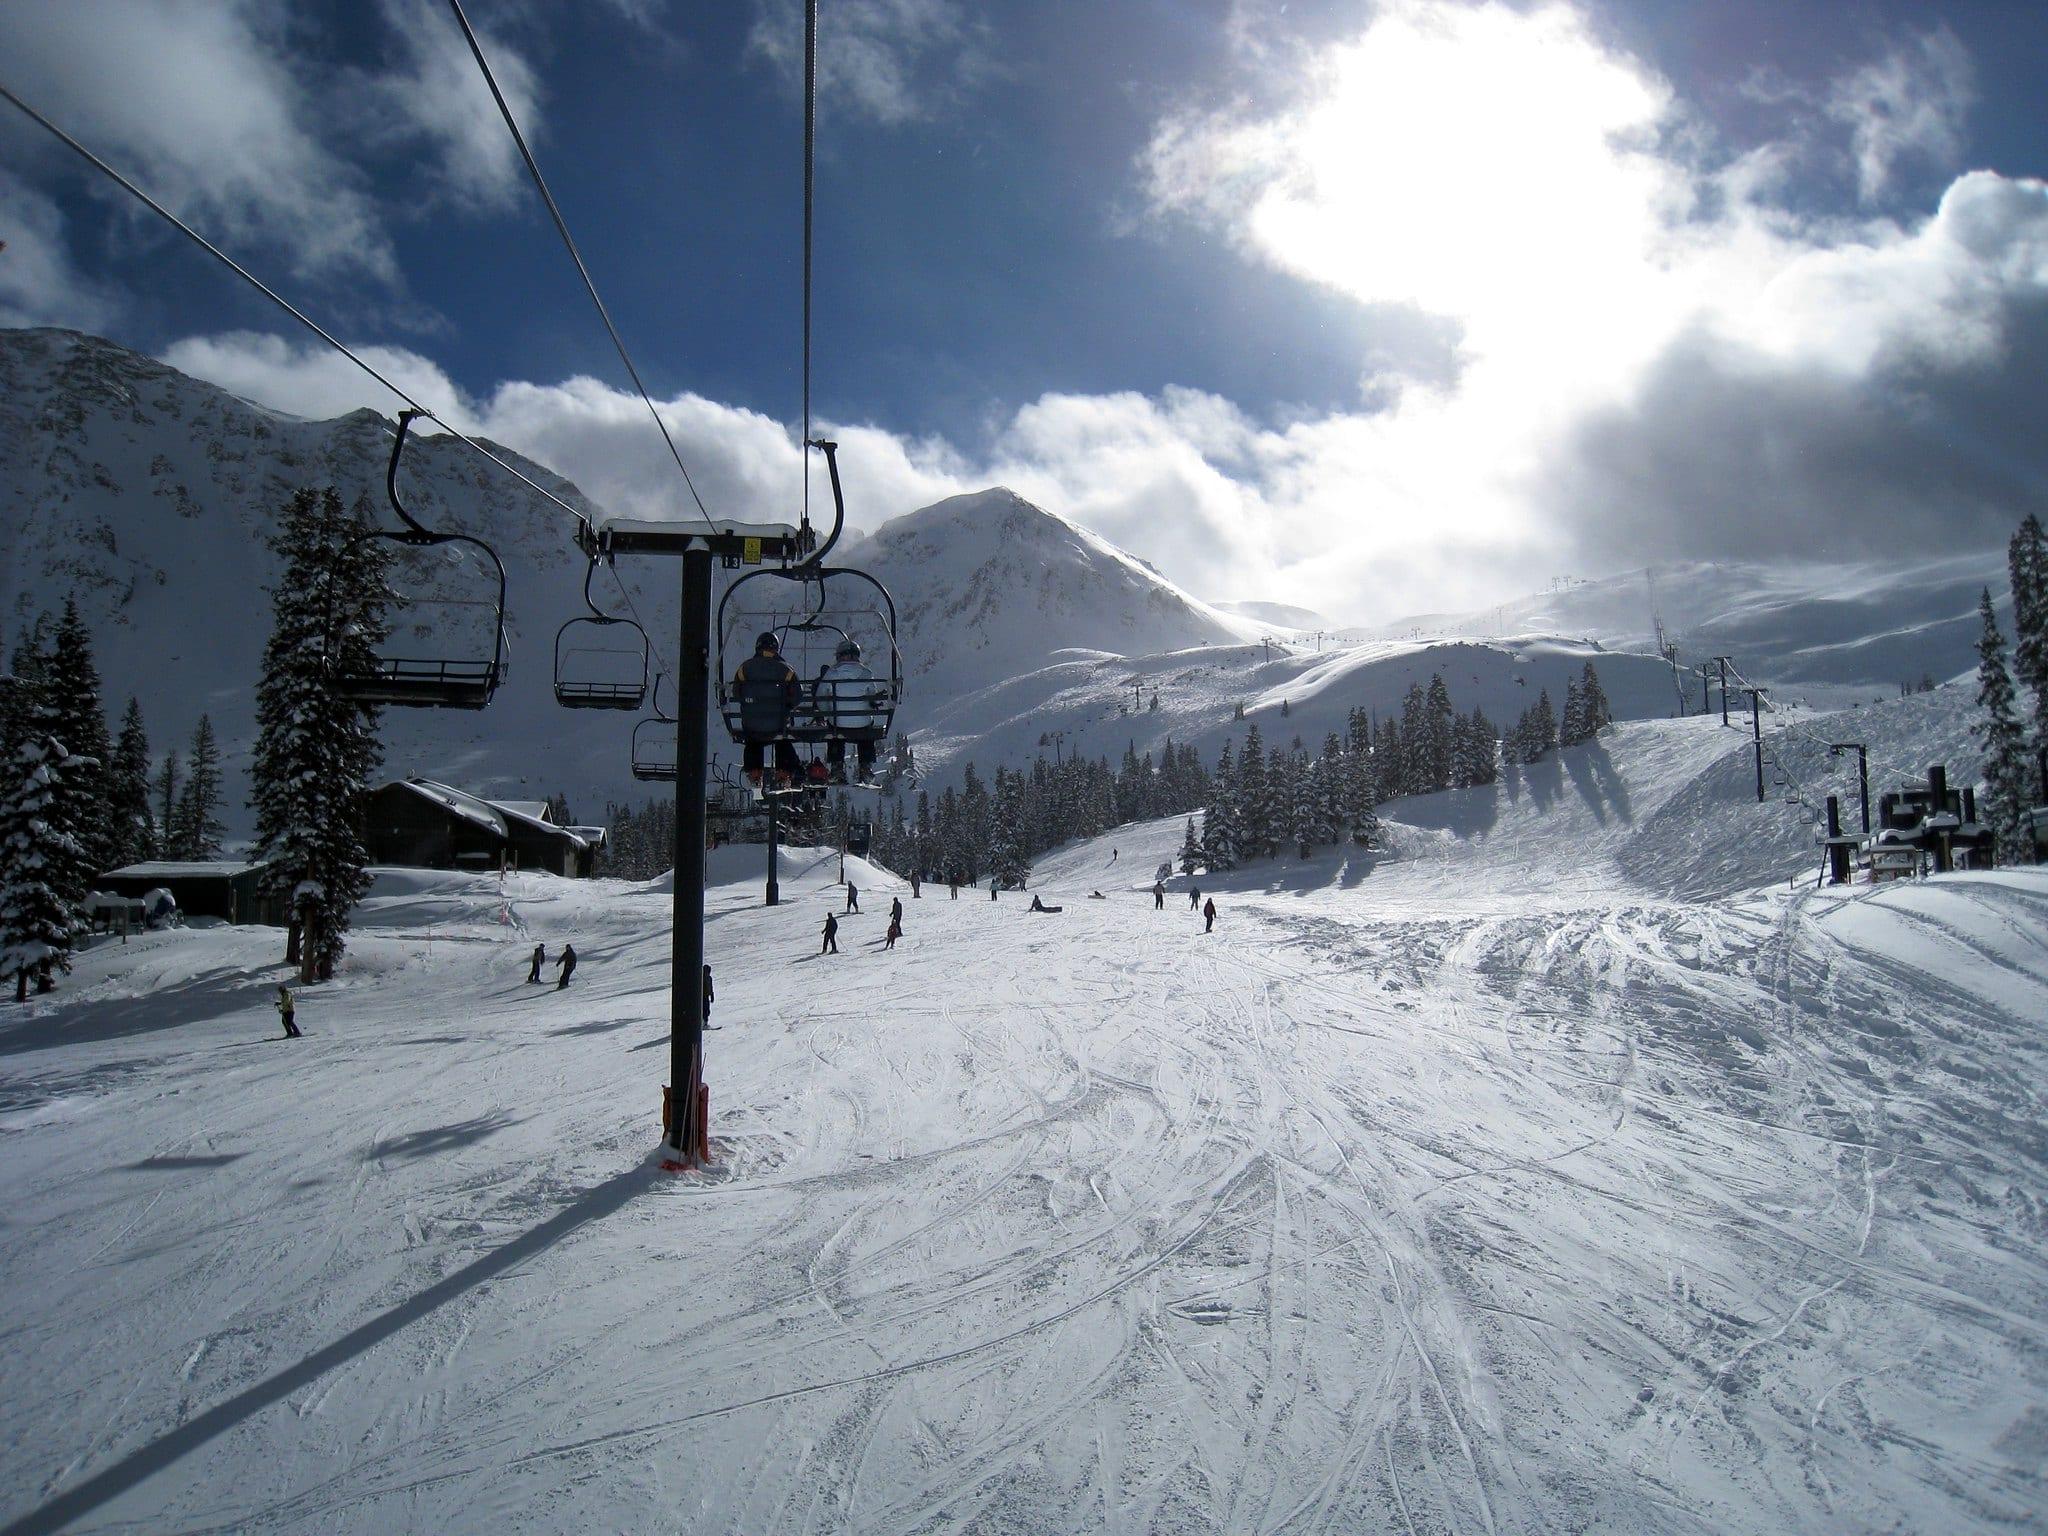 image of arapahoe basin ski resort